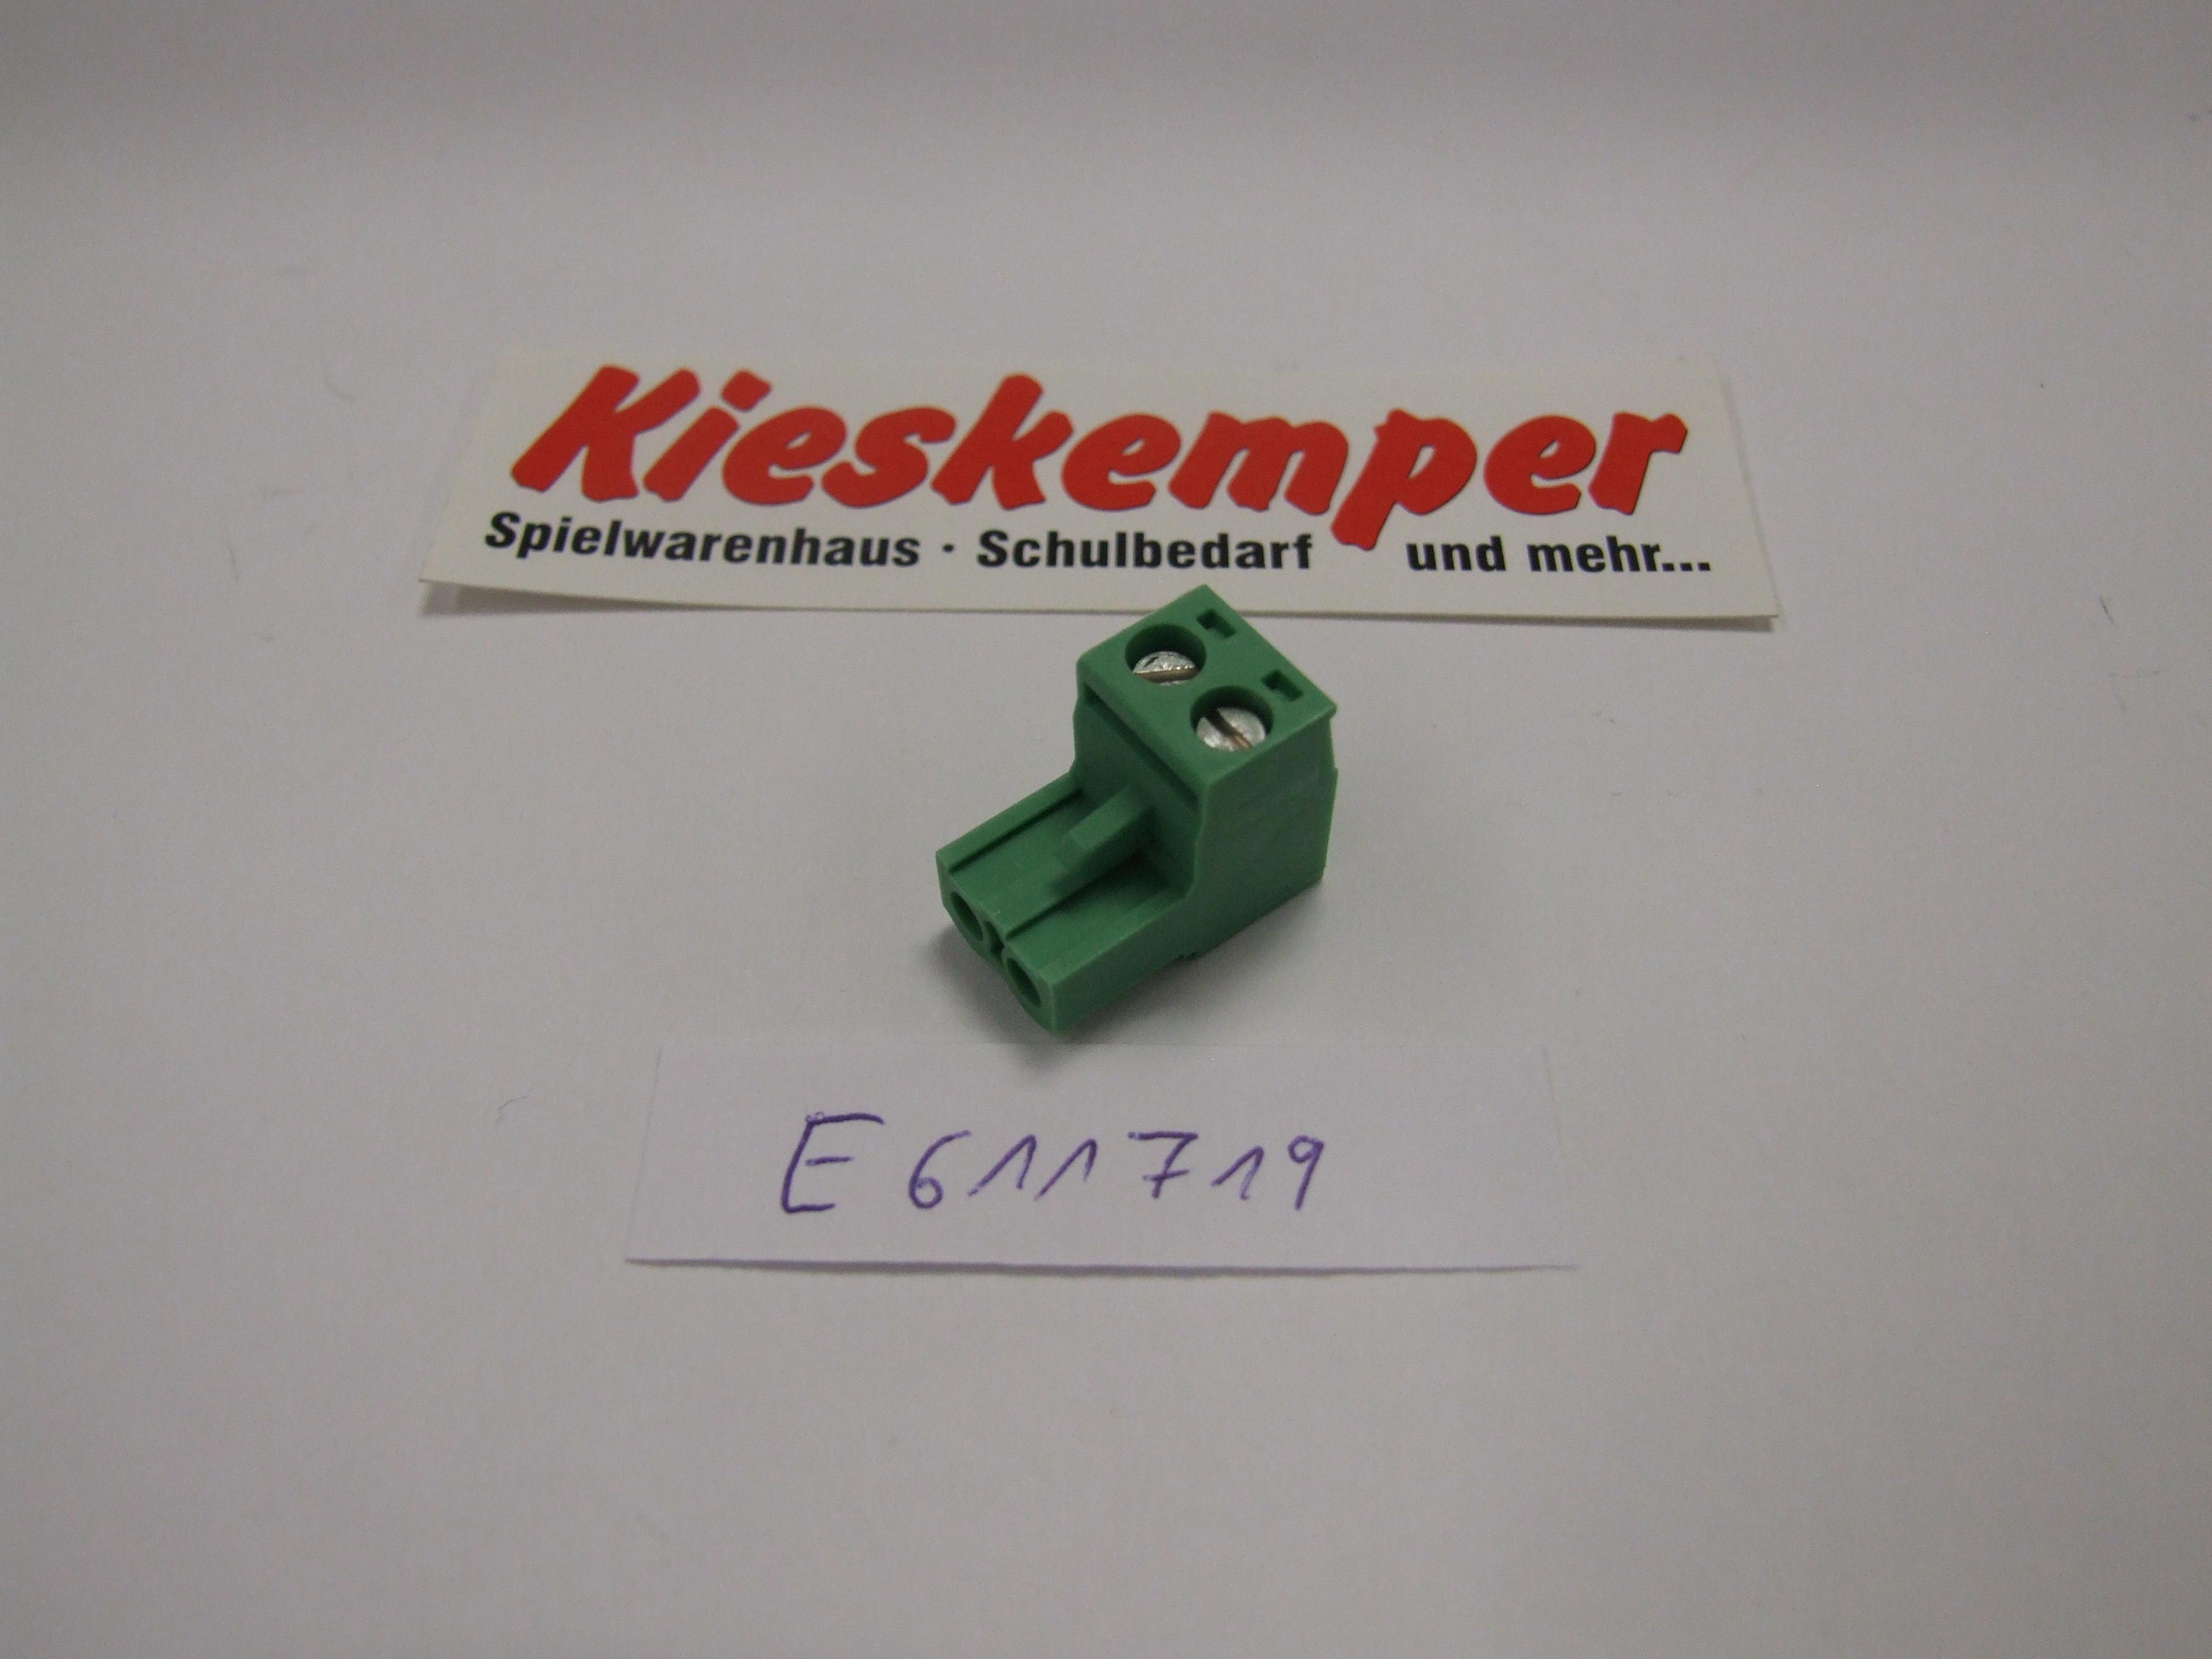 Märklin 611719 Stecker Gleisanschluss